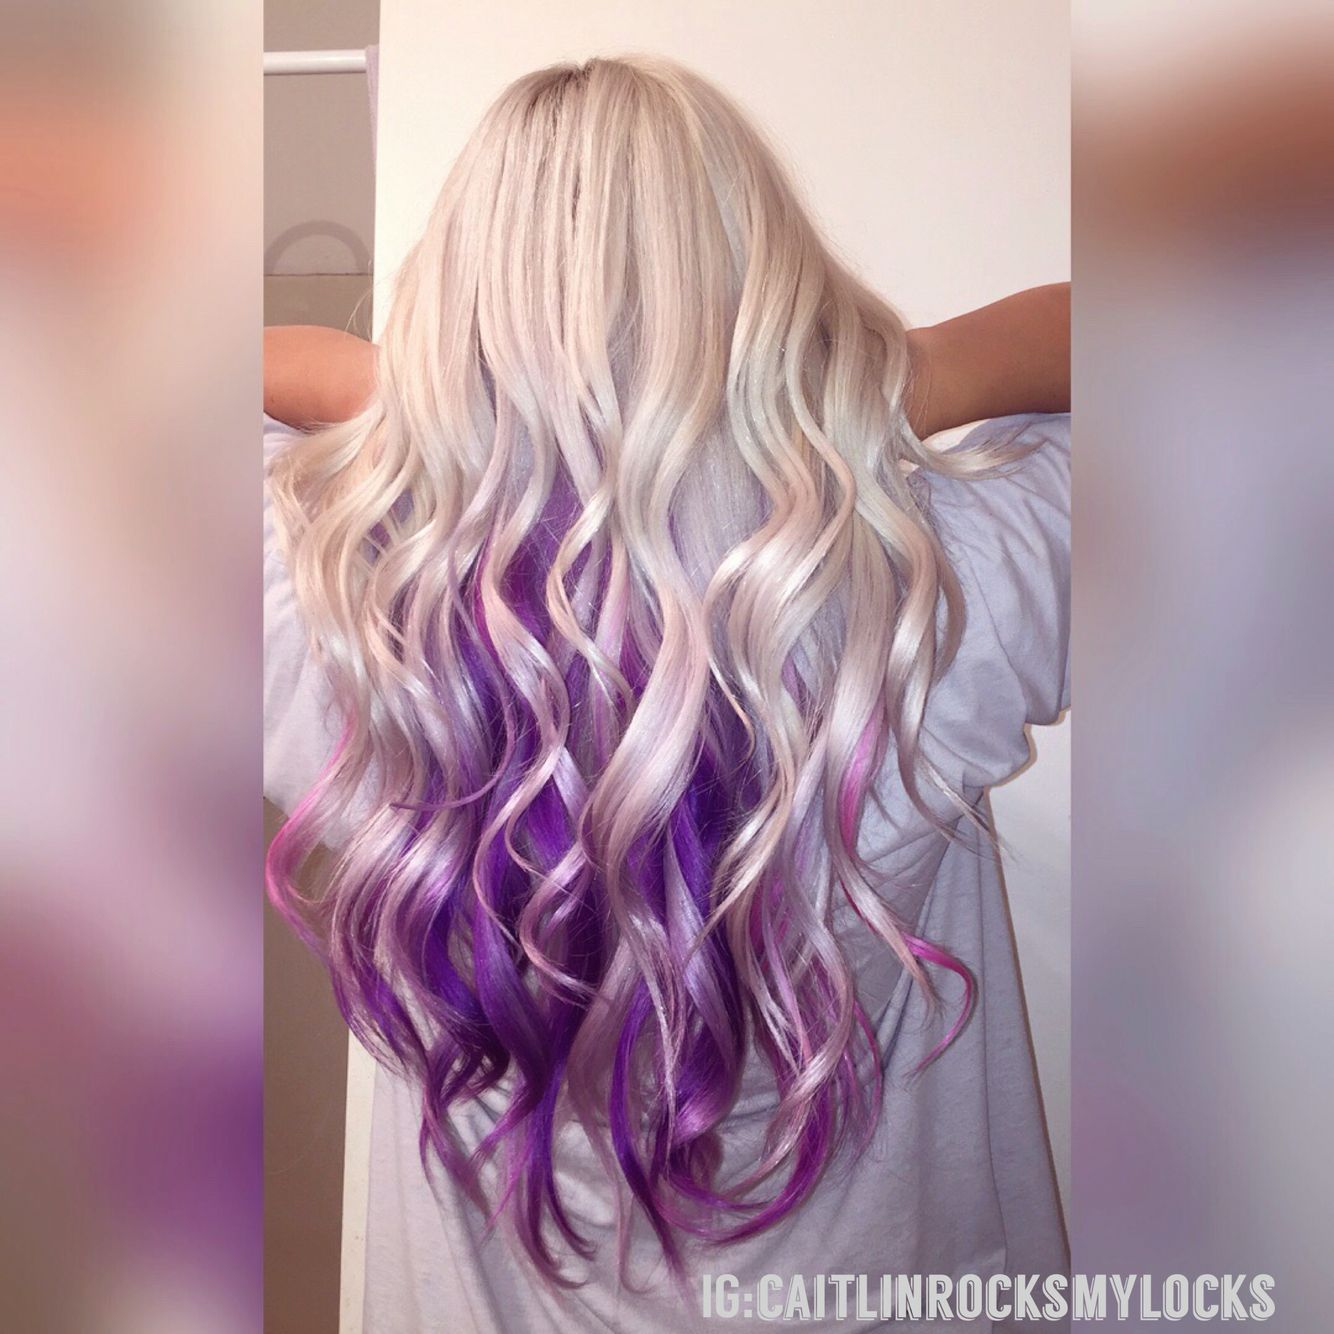 Purple Hair Mermaid Hair Platinum Blonde Hair White Hair Purple And Blonde Purple And Pink Colorful Platinum Blonde Hair Ash Hair Color Blonde Hair Color